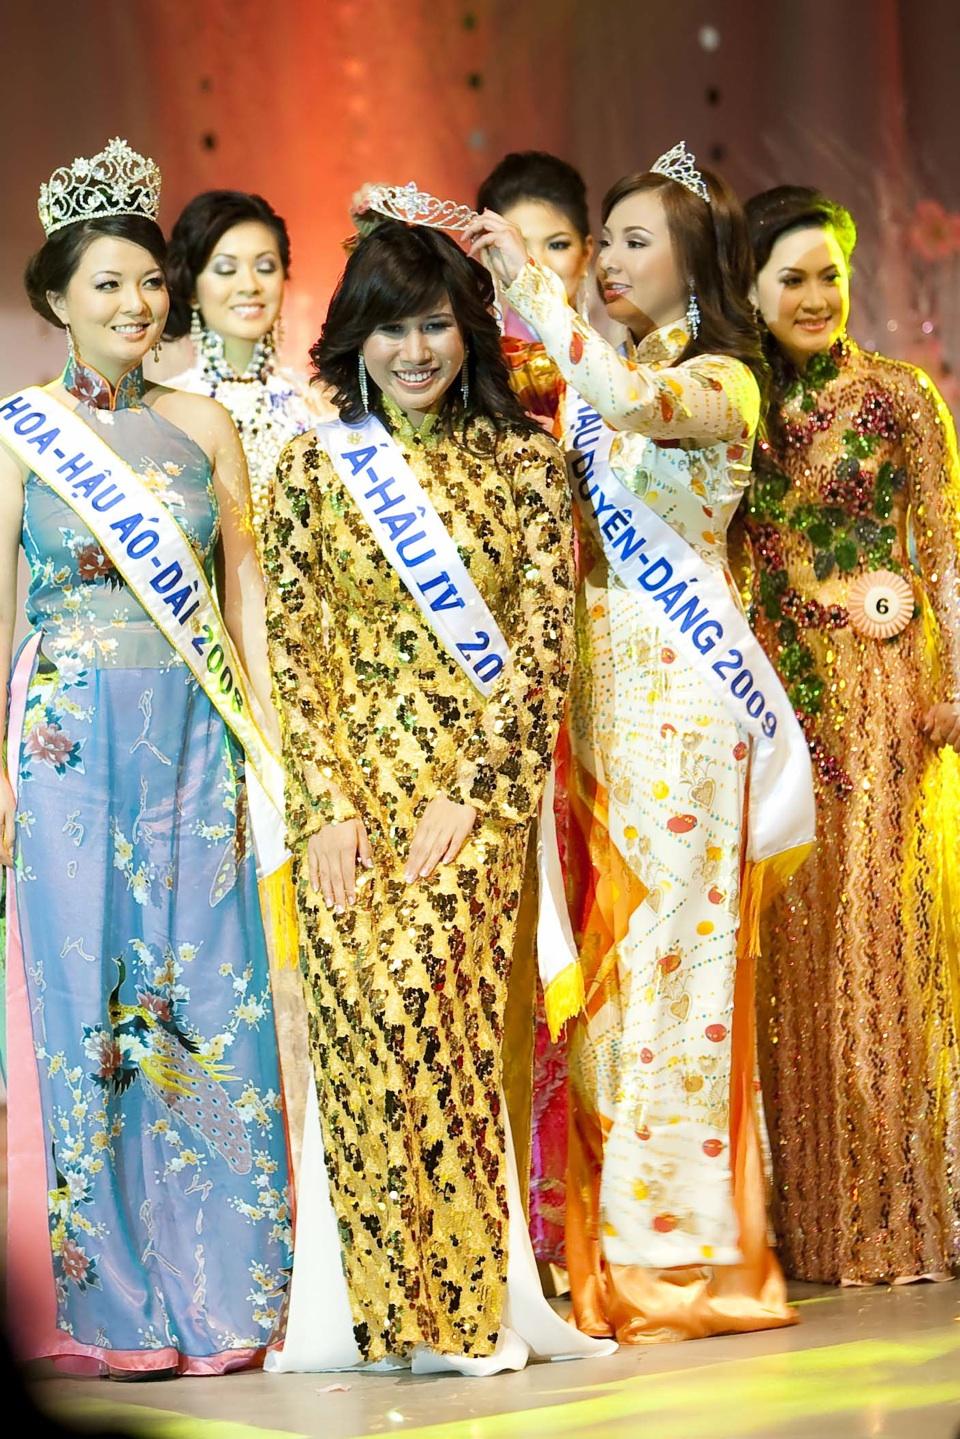 Miss Vietnam - Hoa Hau Ao Dai Bac Cali 2010 - Pageant Day - Image 120